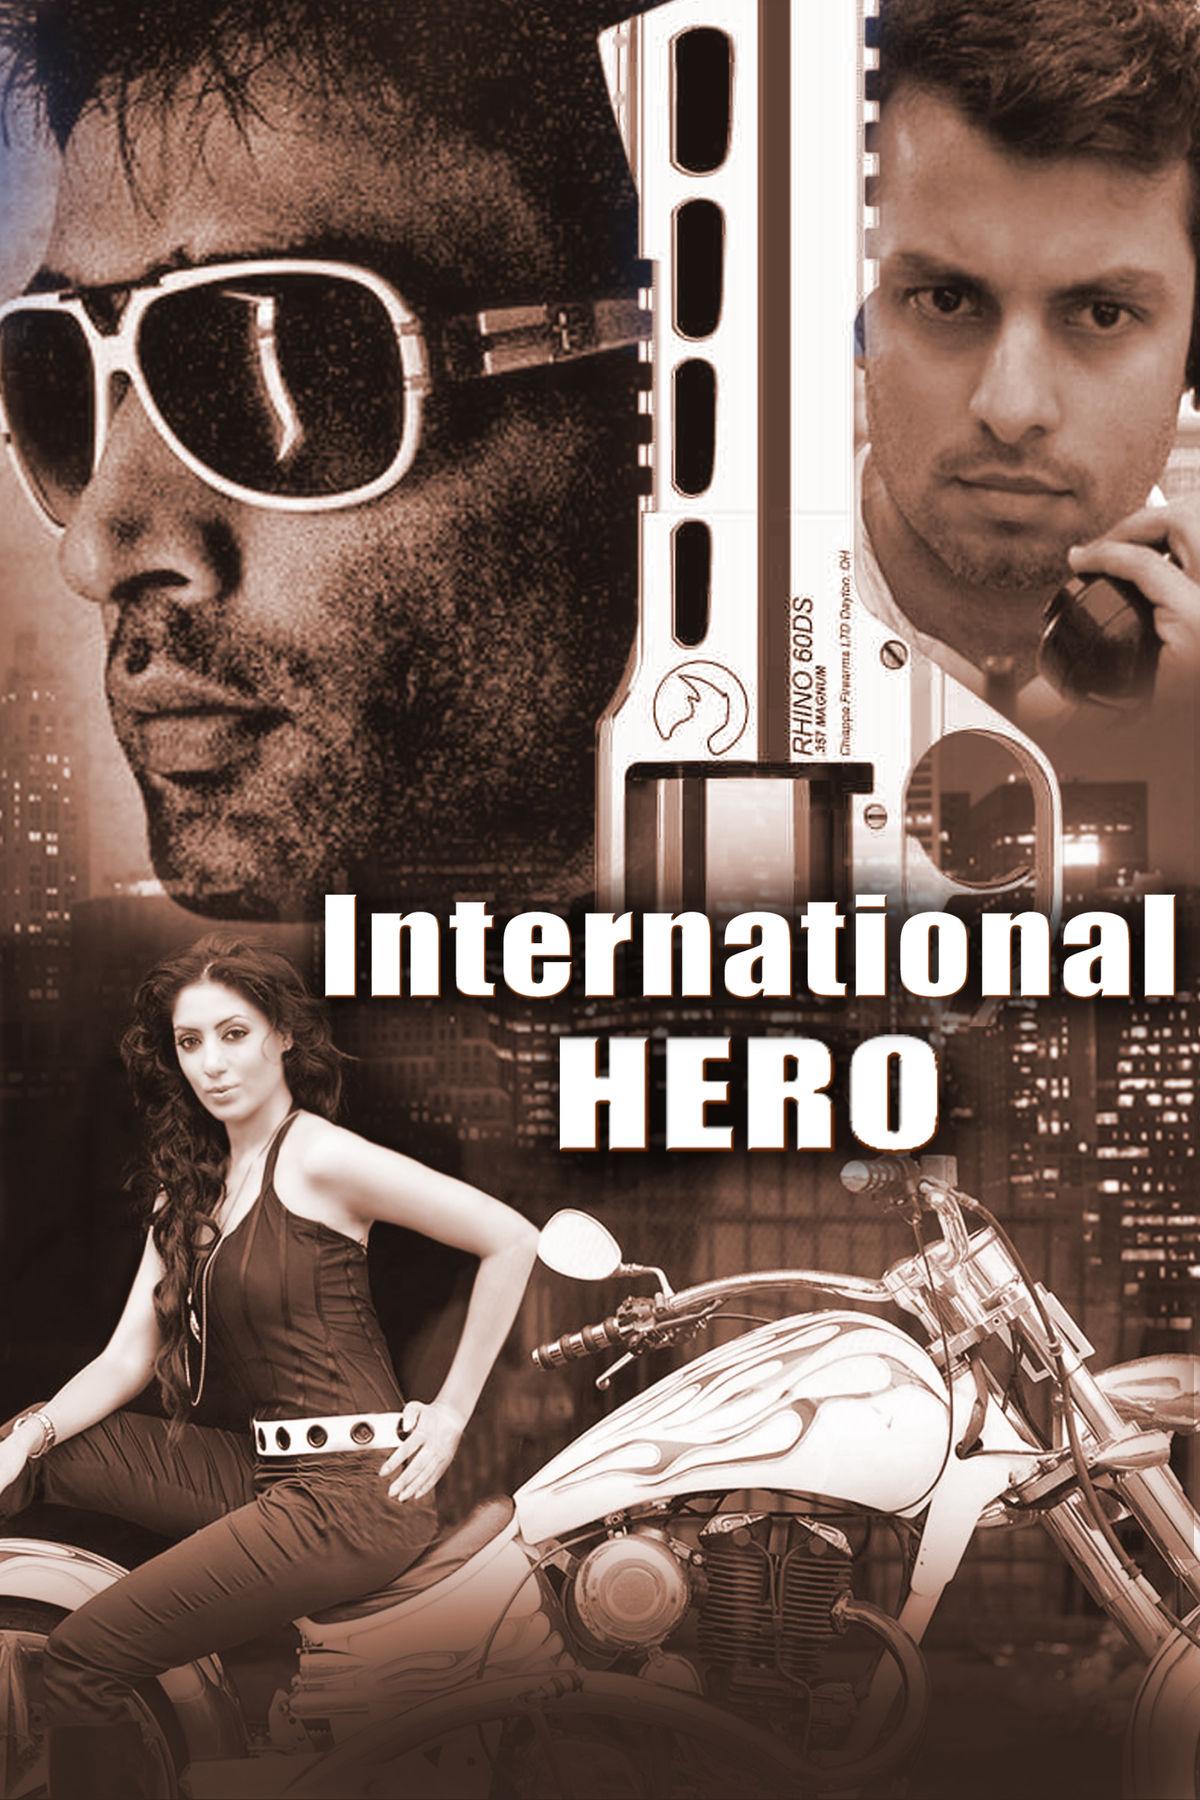 Shahbaaz Khan Best Movies, TV Shows and Web Series List